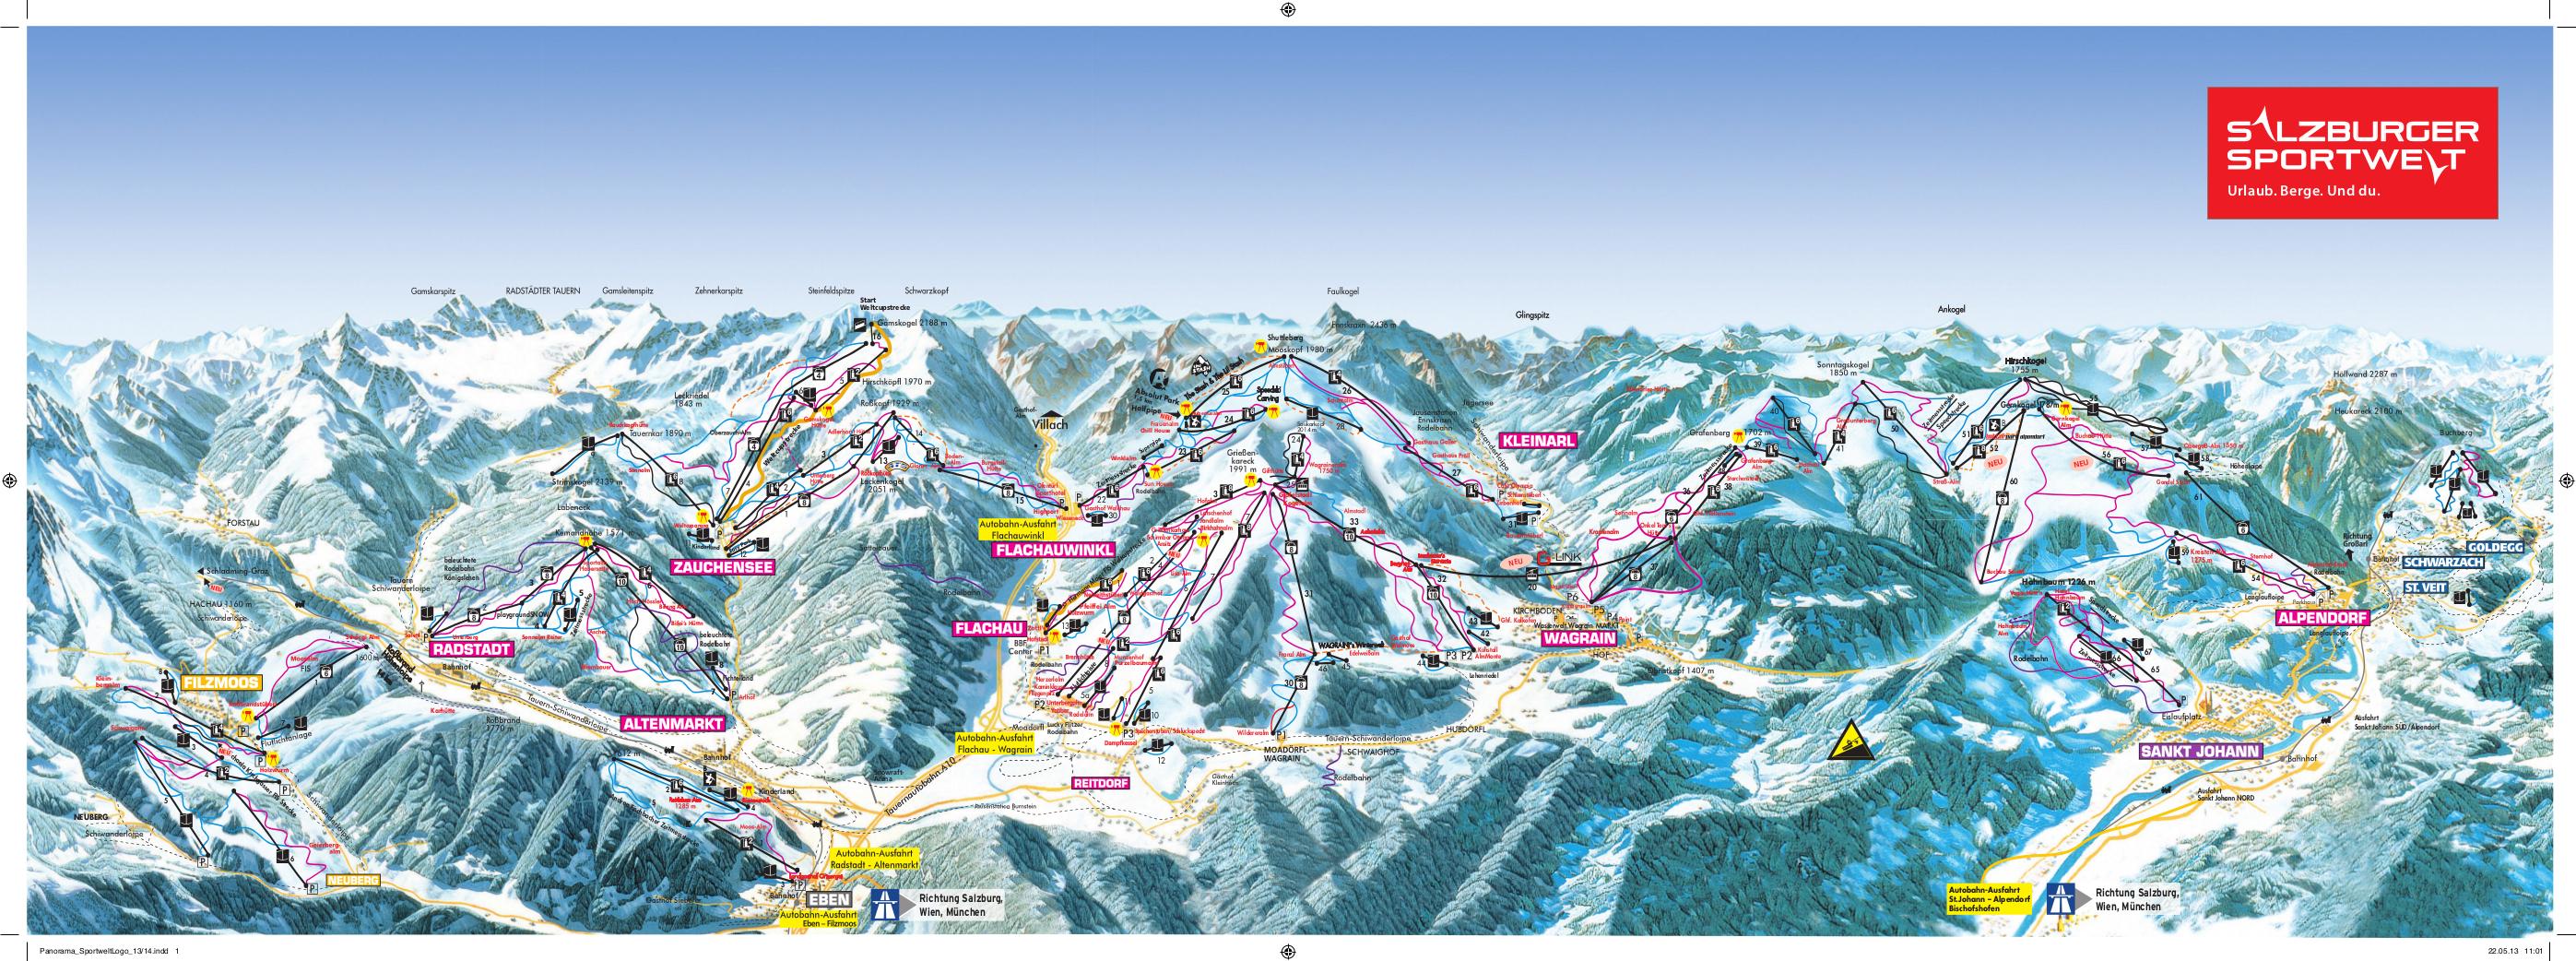 skigebiet flachau salzburger sportwelt skifahren pistenplan apr s ski. Black Bedroom Furniture Sets. Home Design Ideas